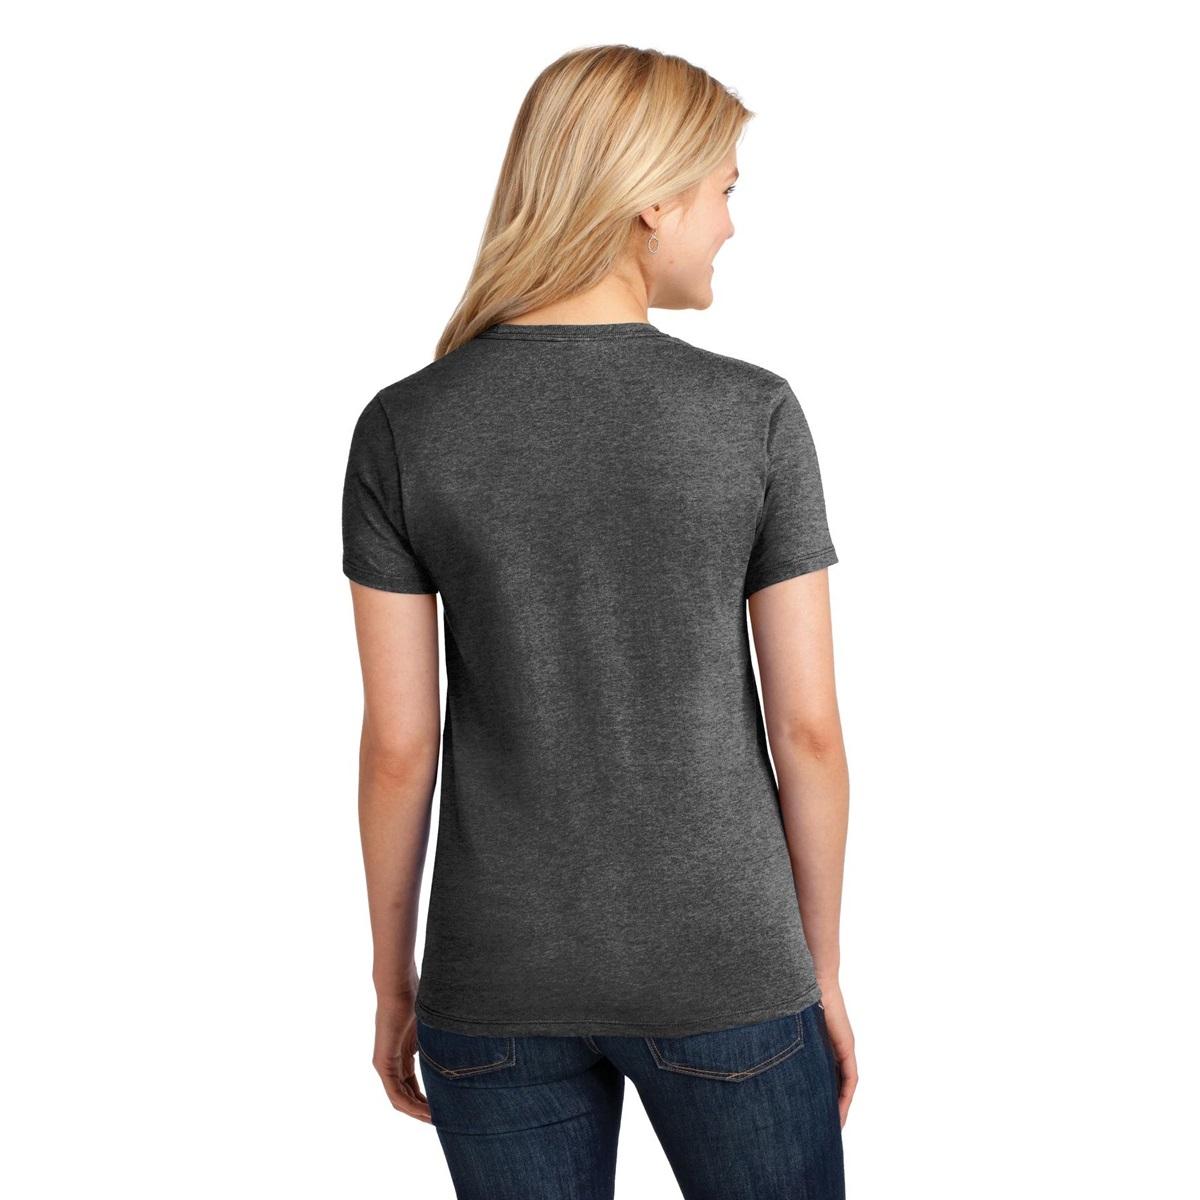 Port Company Lpc54 Ladies 5 4 Oz Cotton T Shirt Dark